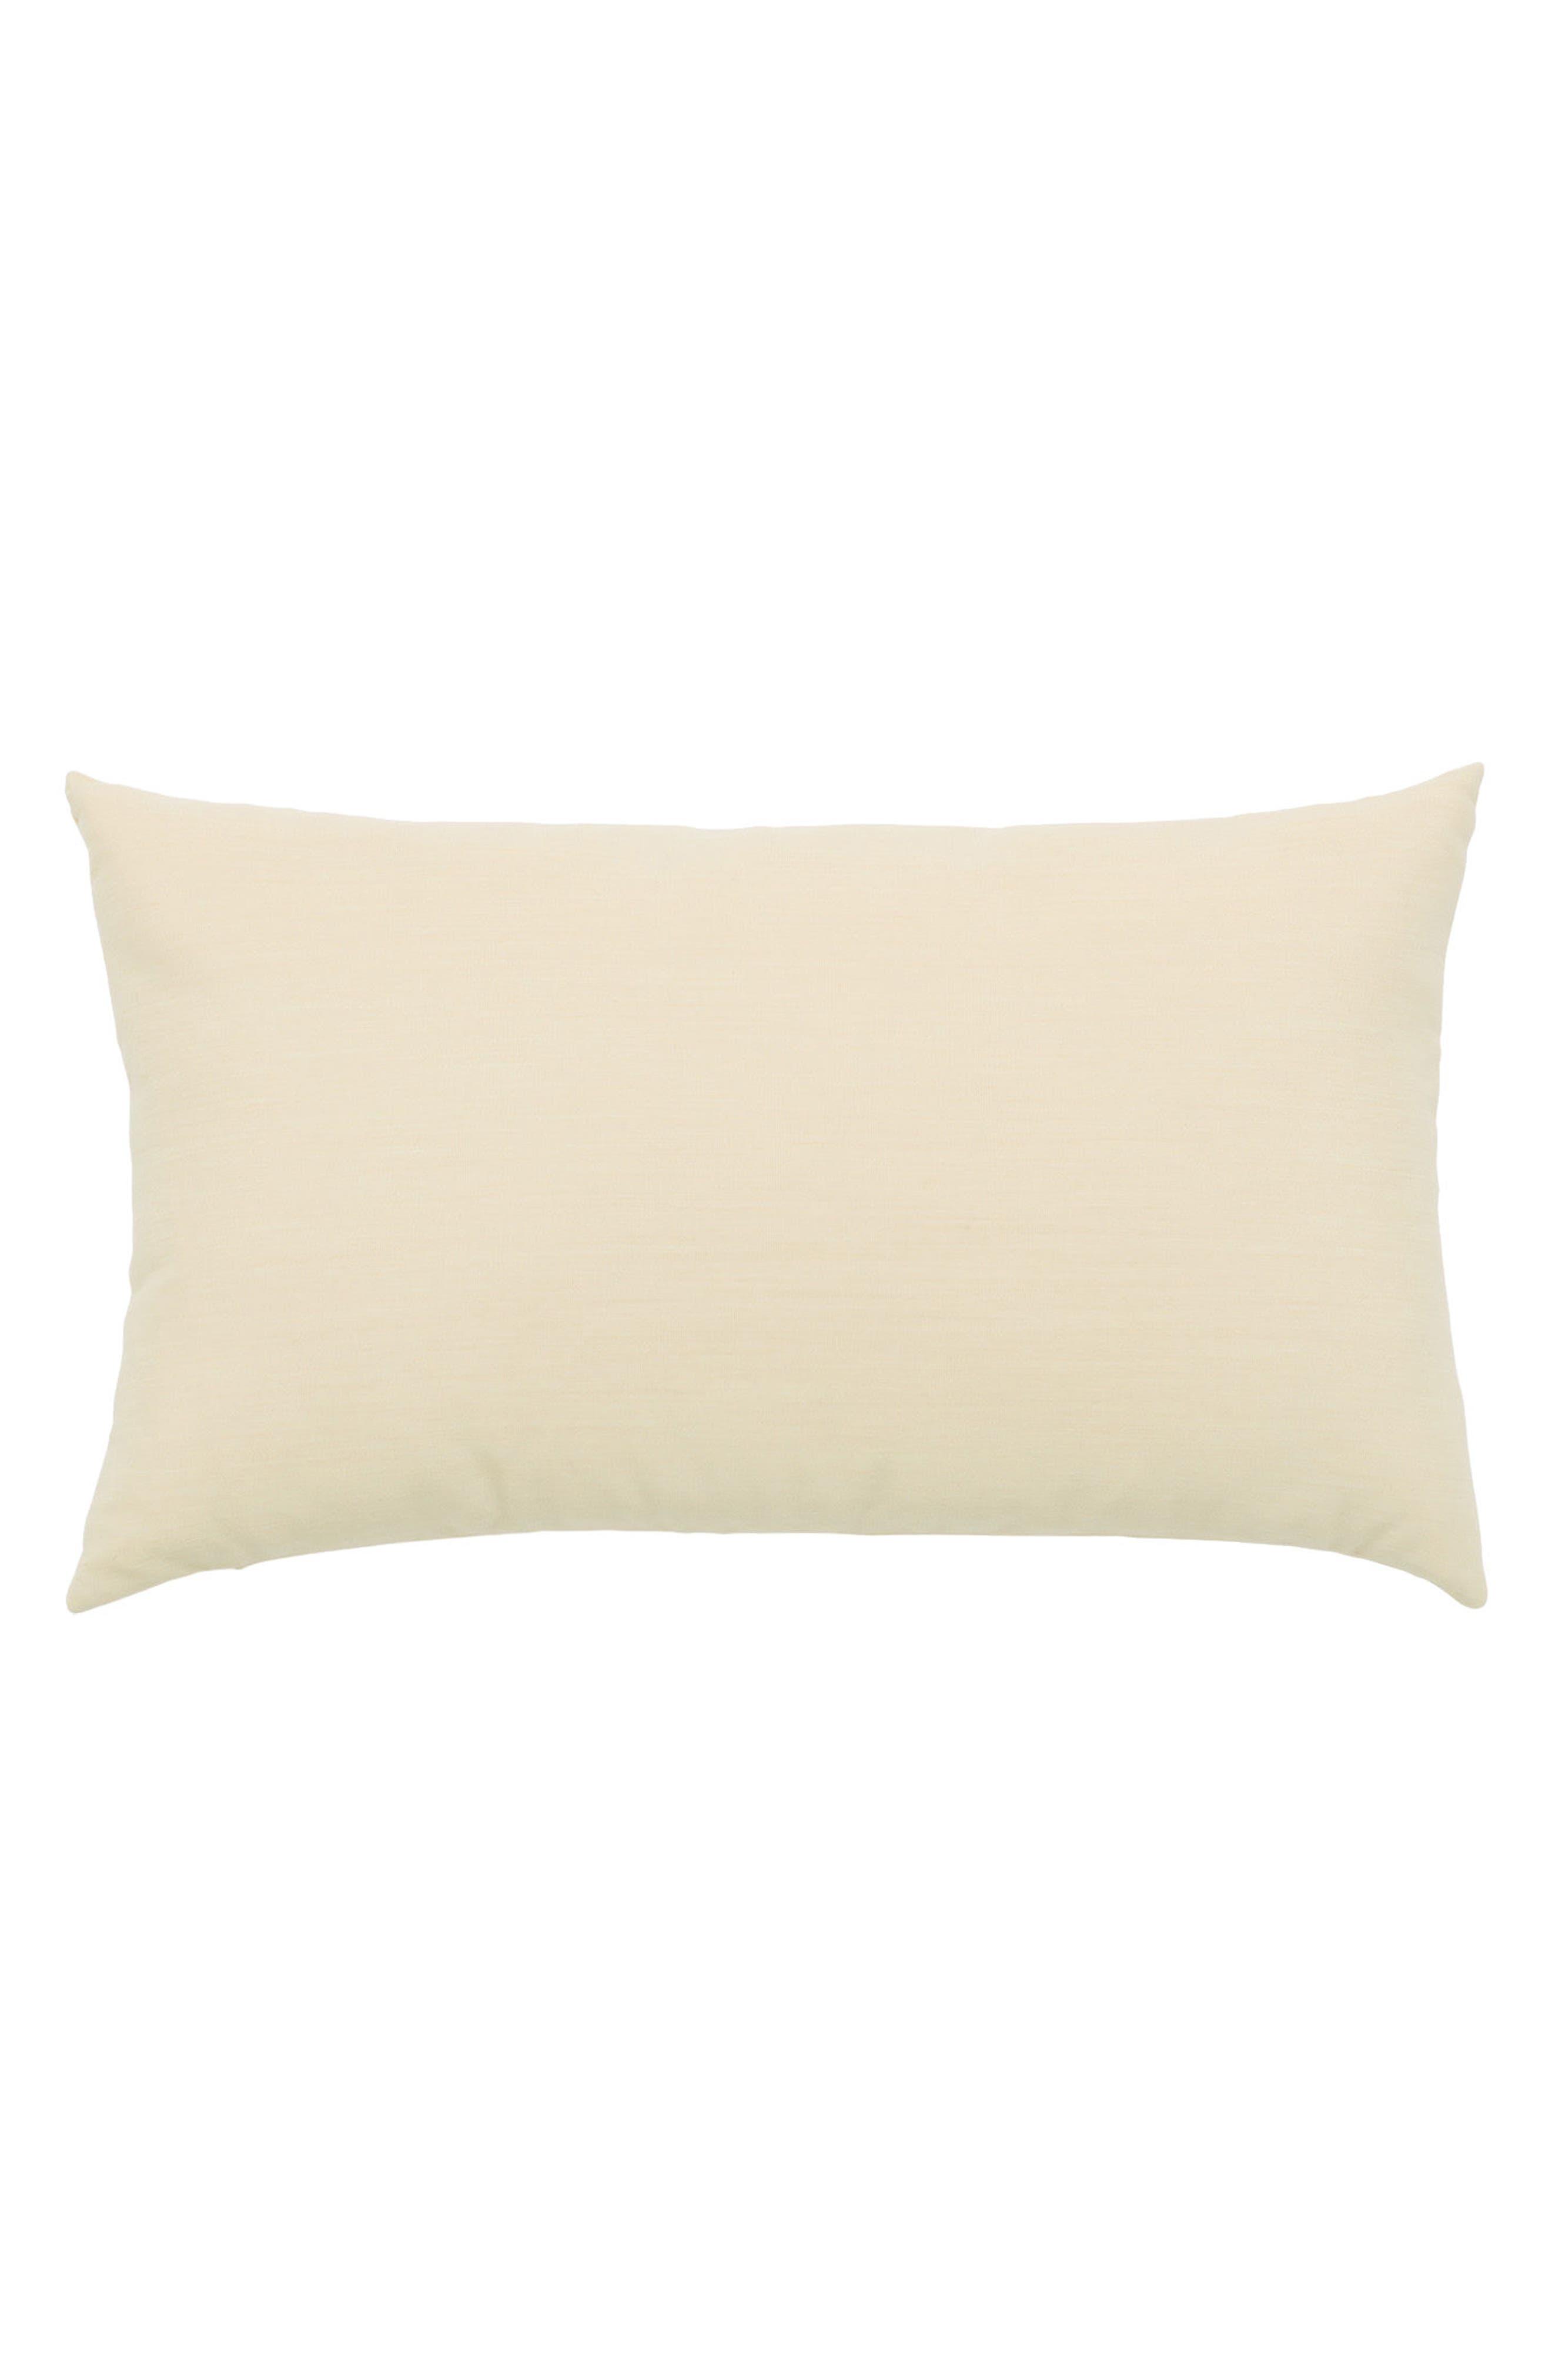 Modern Oval Candy Lumbar Pillow,                             Alternate thumbnail 2, color,                             650